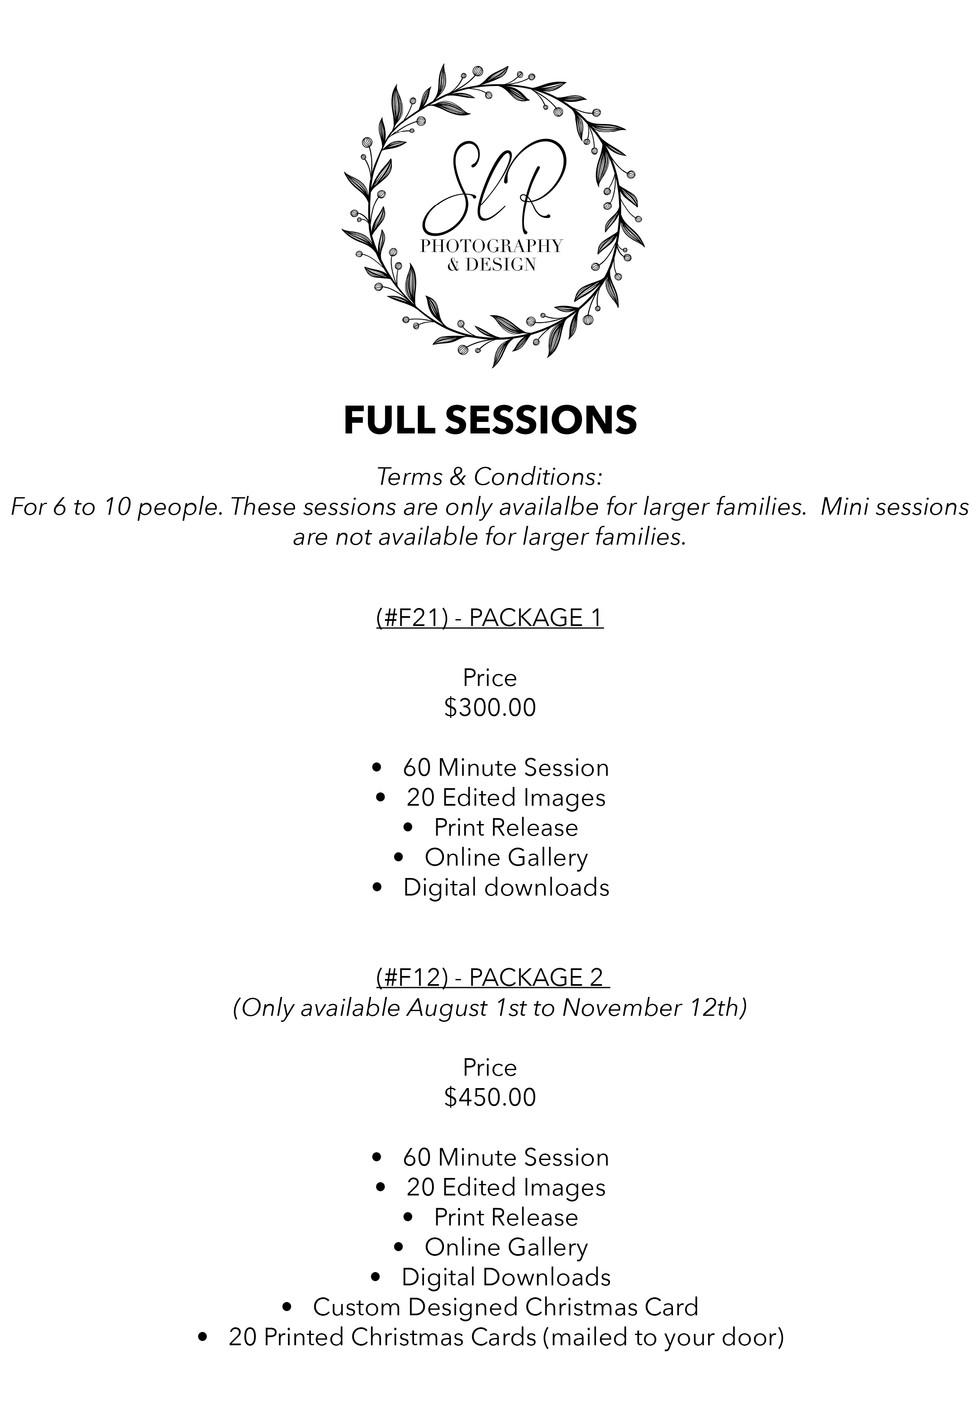 SLR Photography & Design price sheet -3.